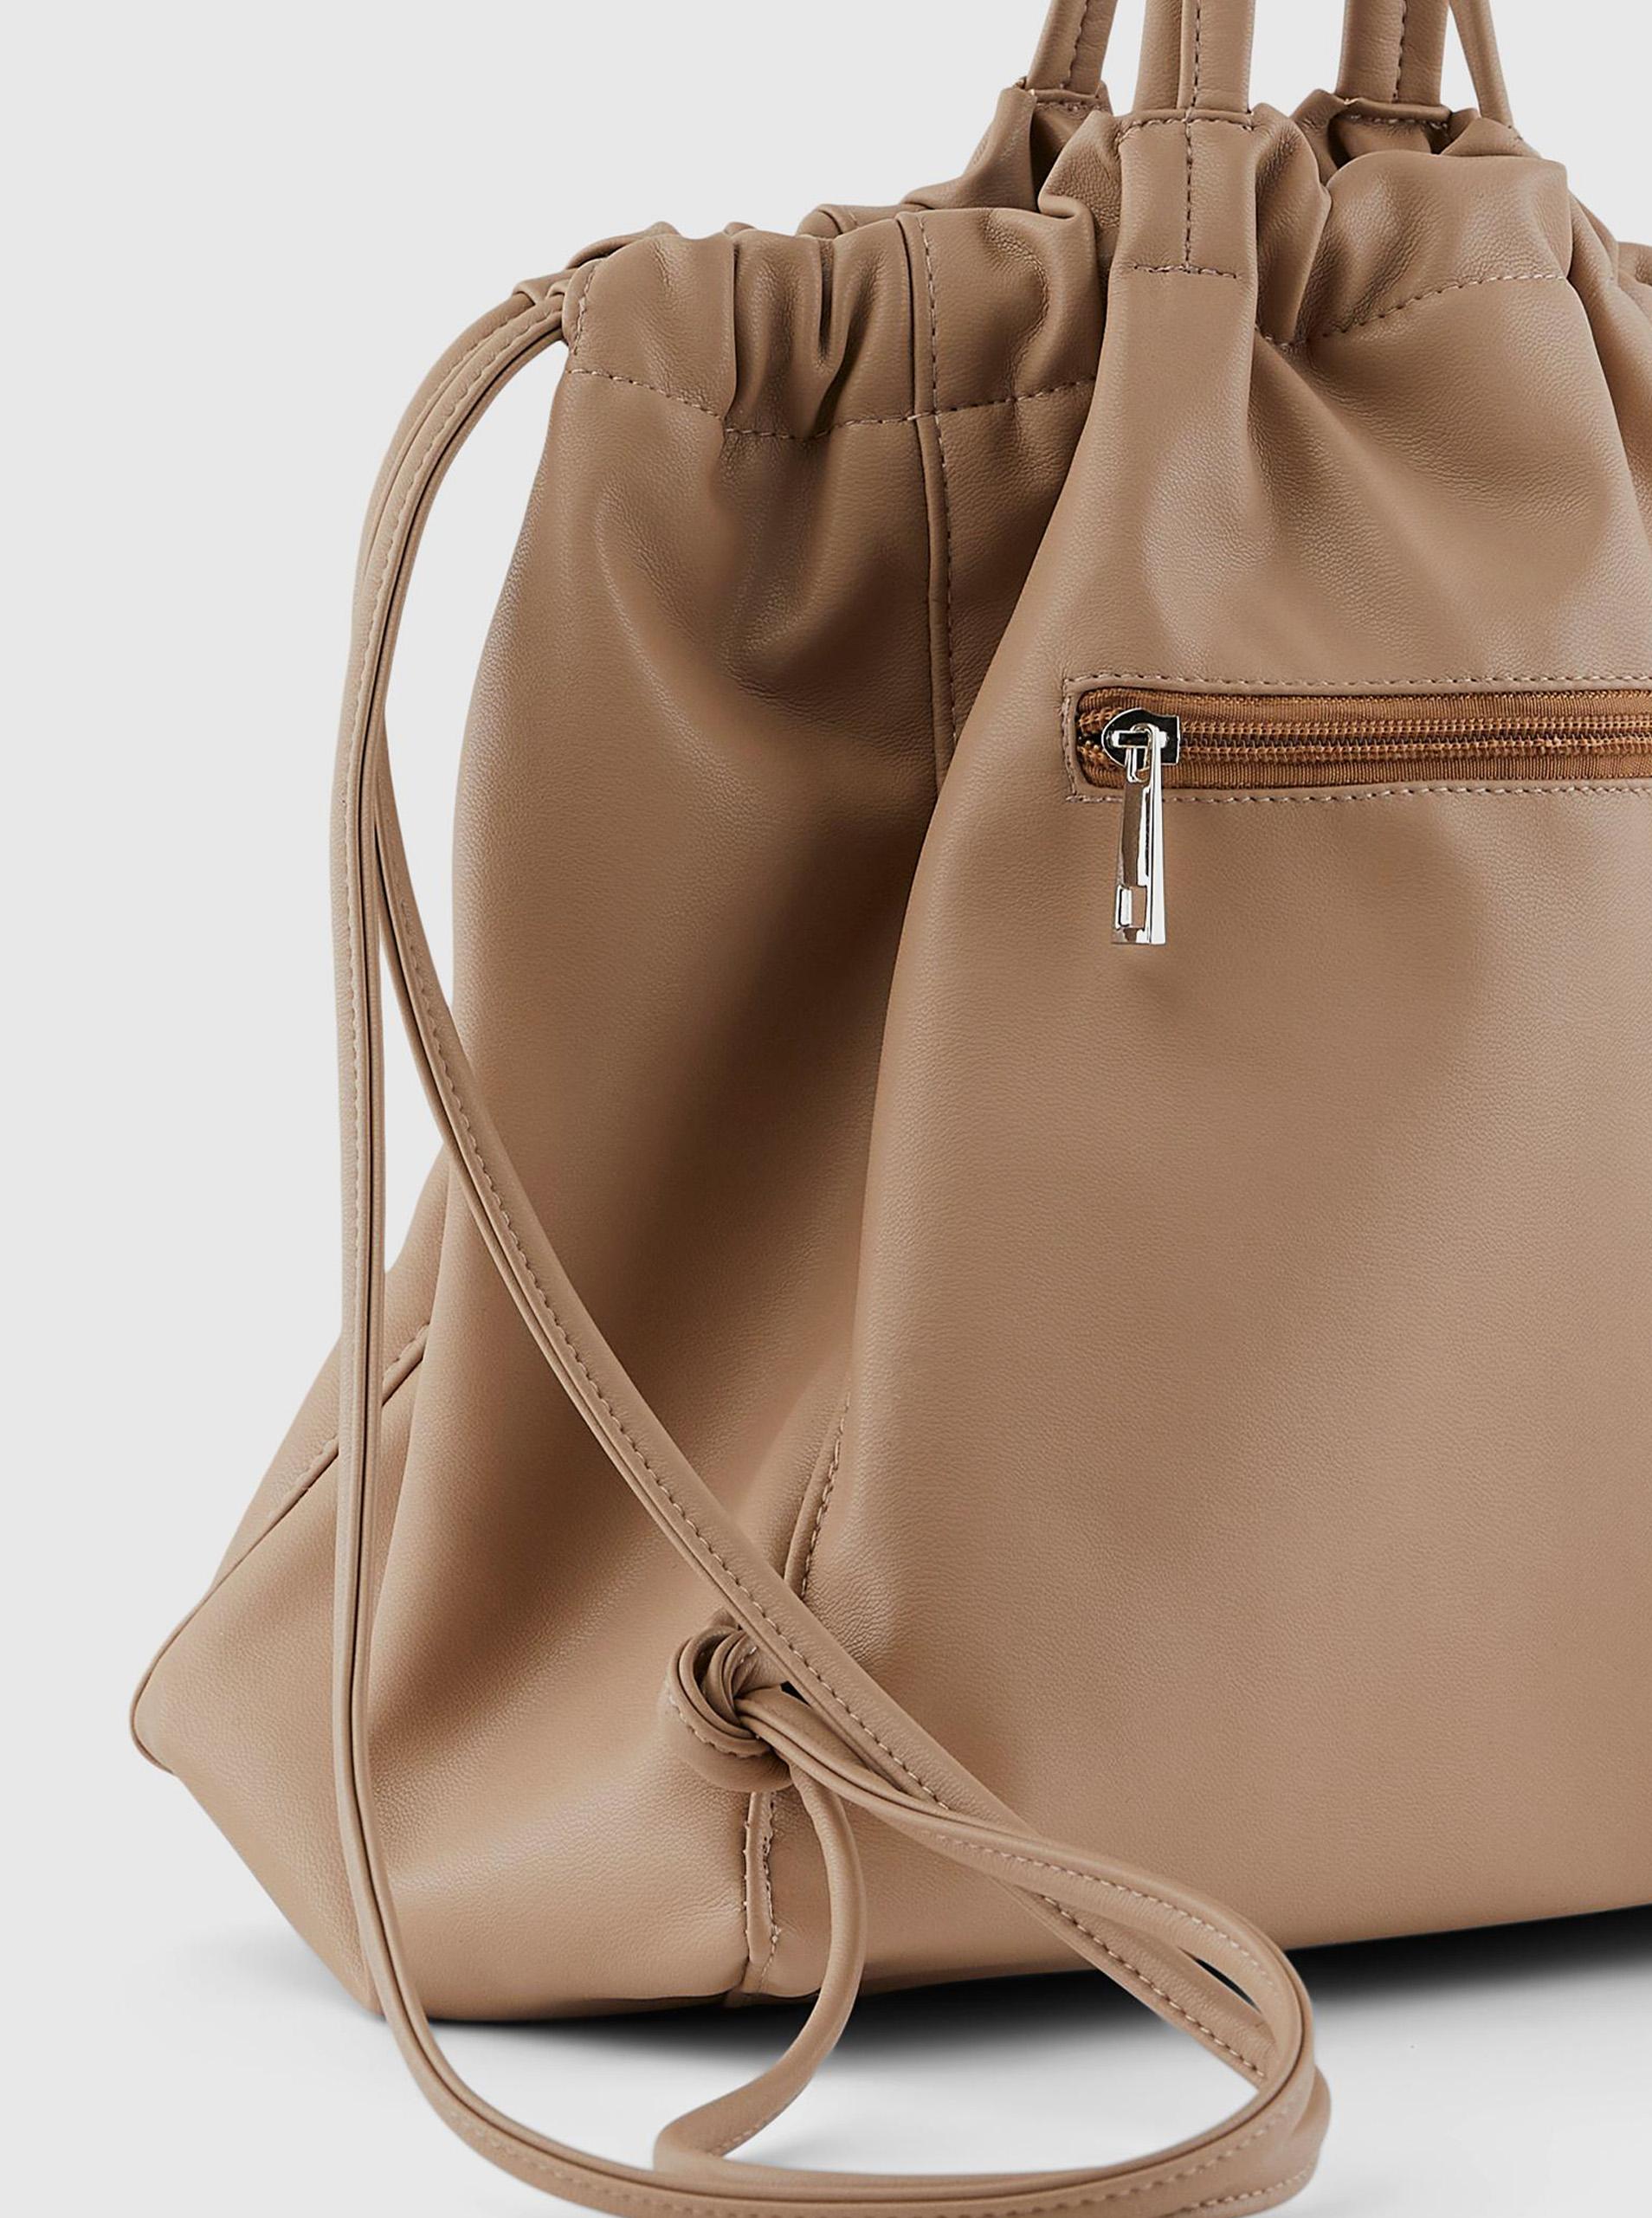 Pieces beige drawstring bag Talli